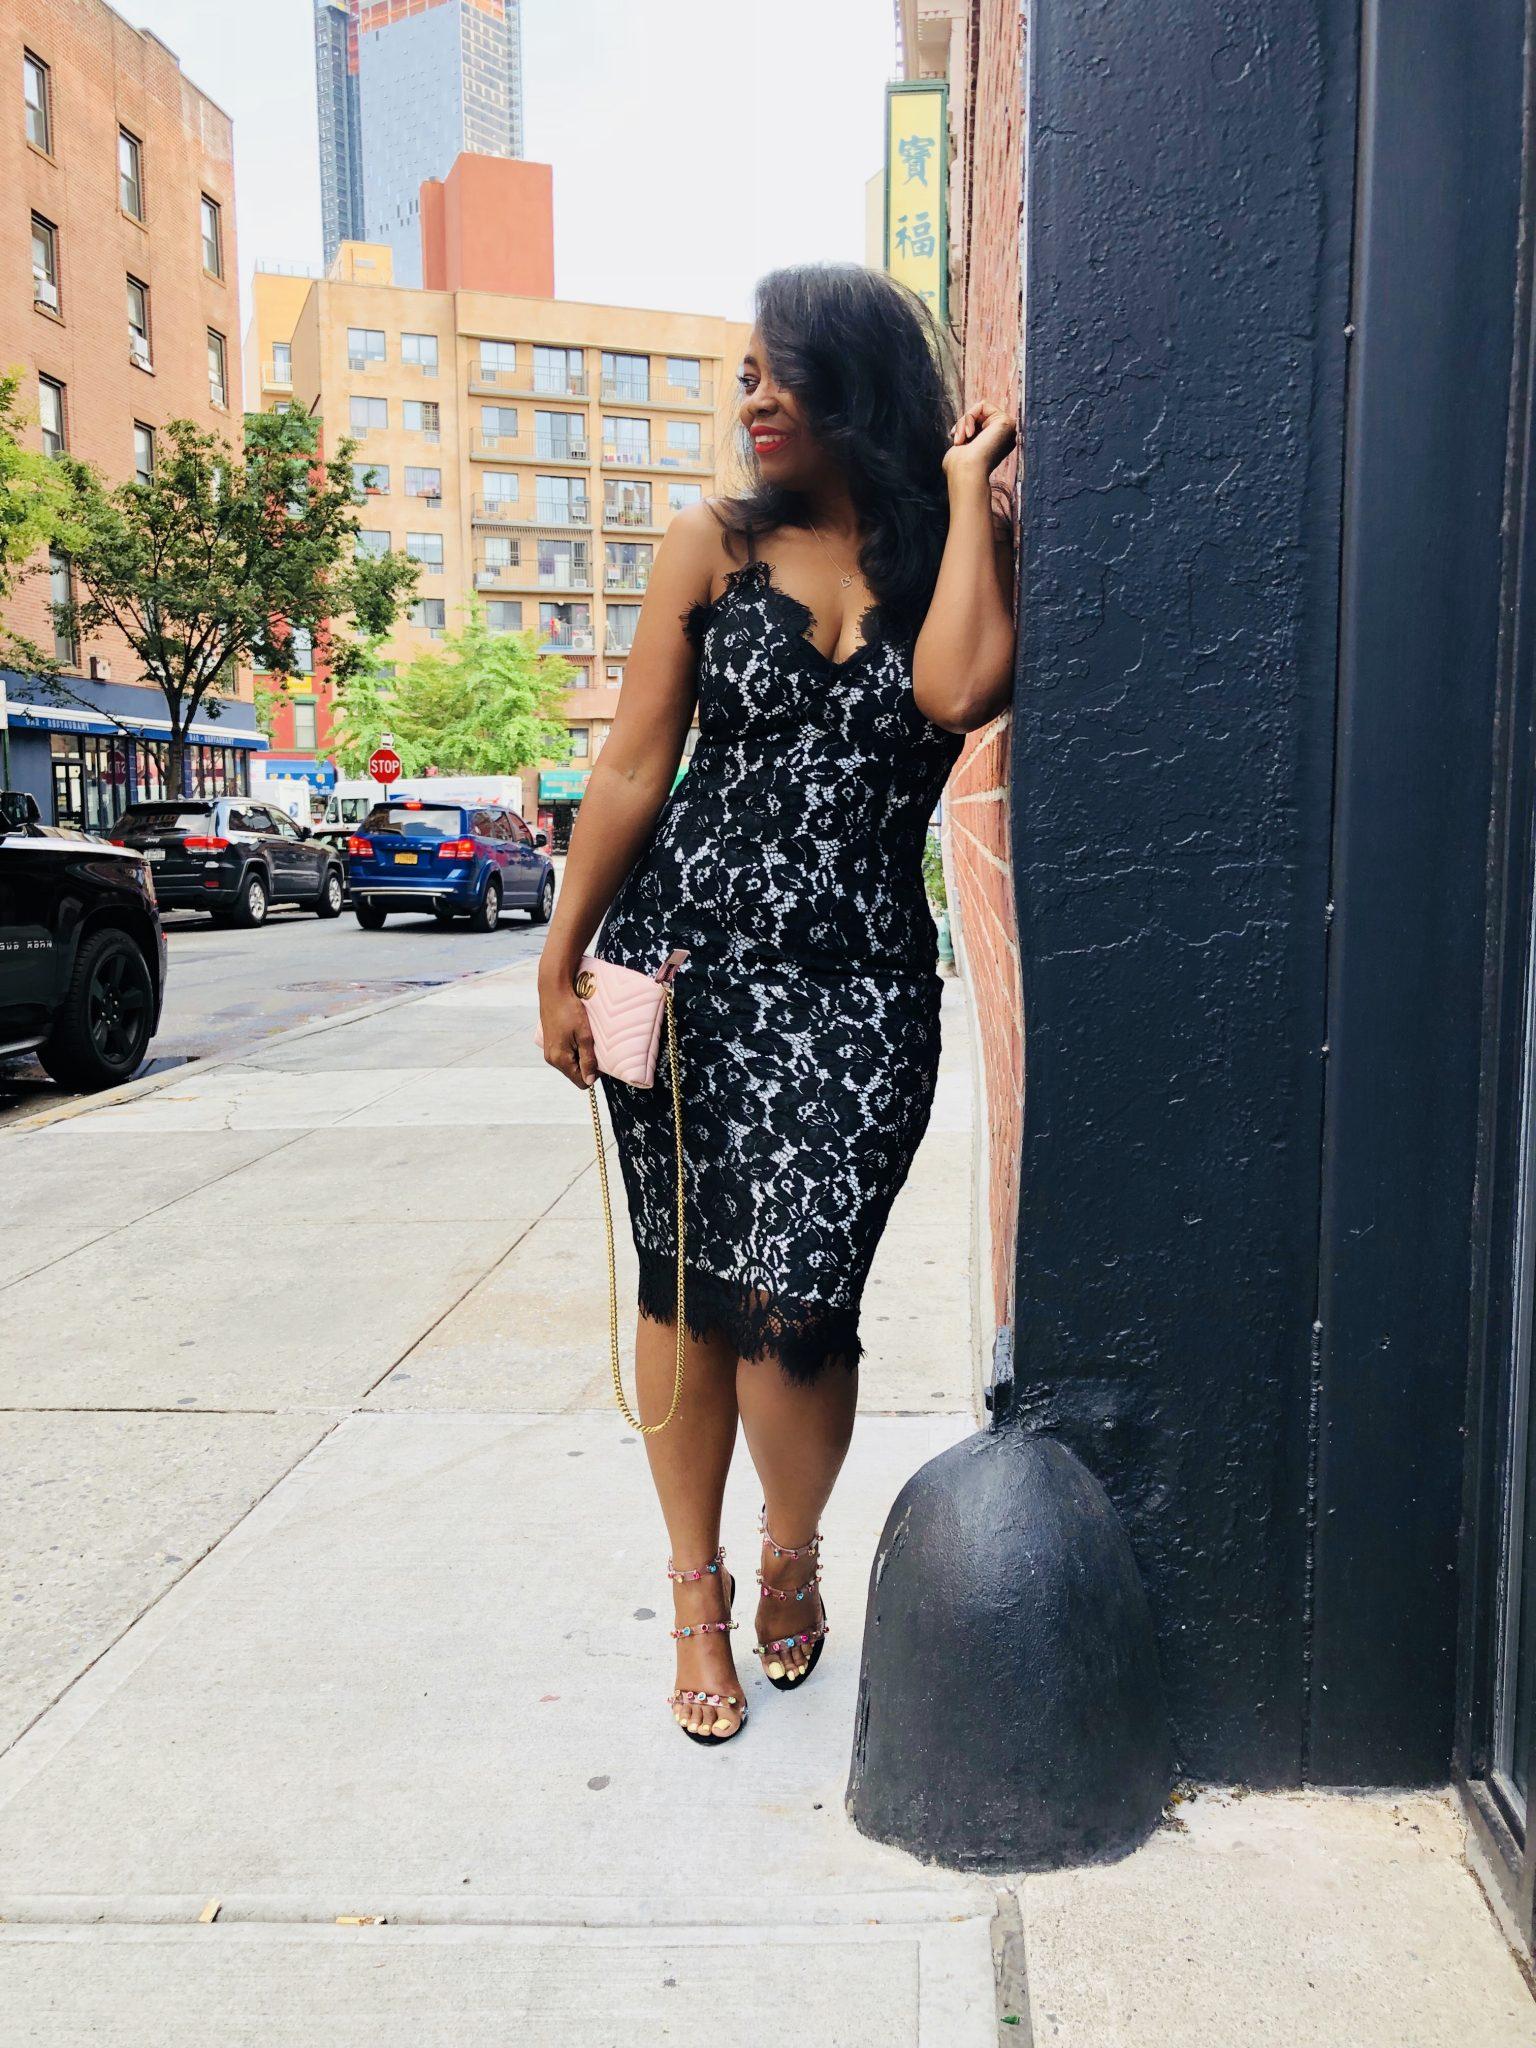 My Style: Plush Boutique Lace Dress